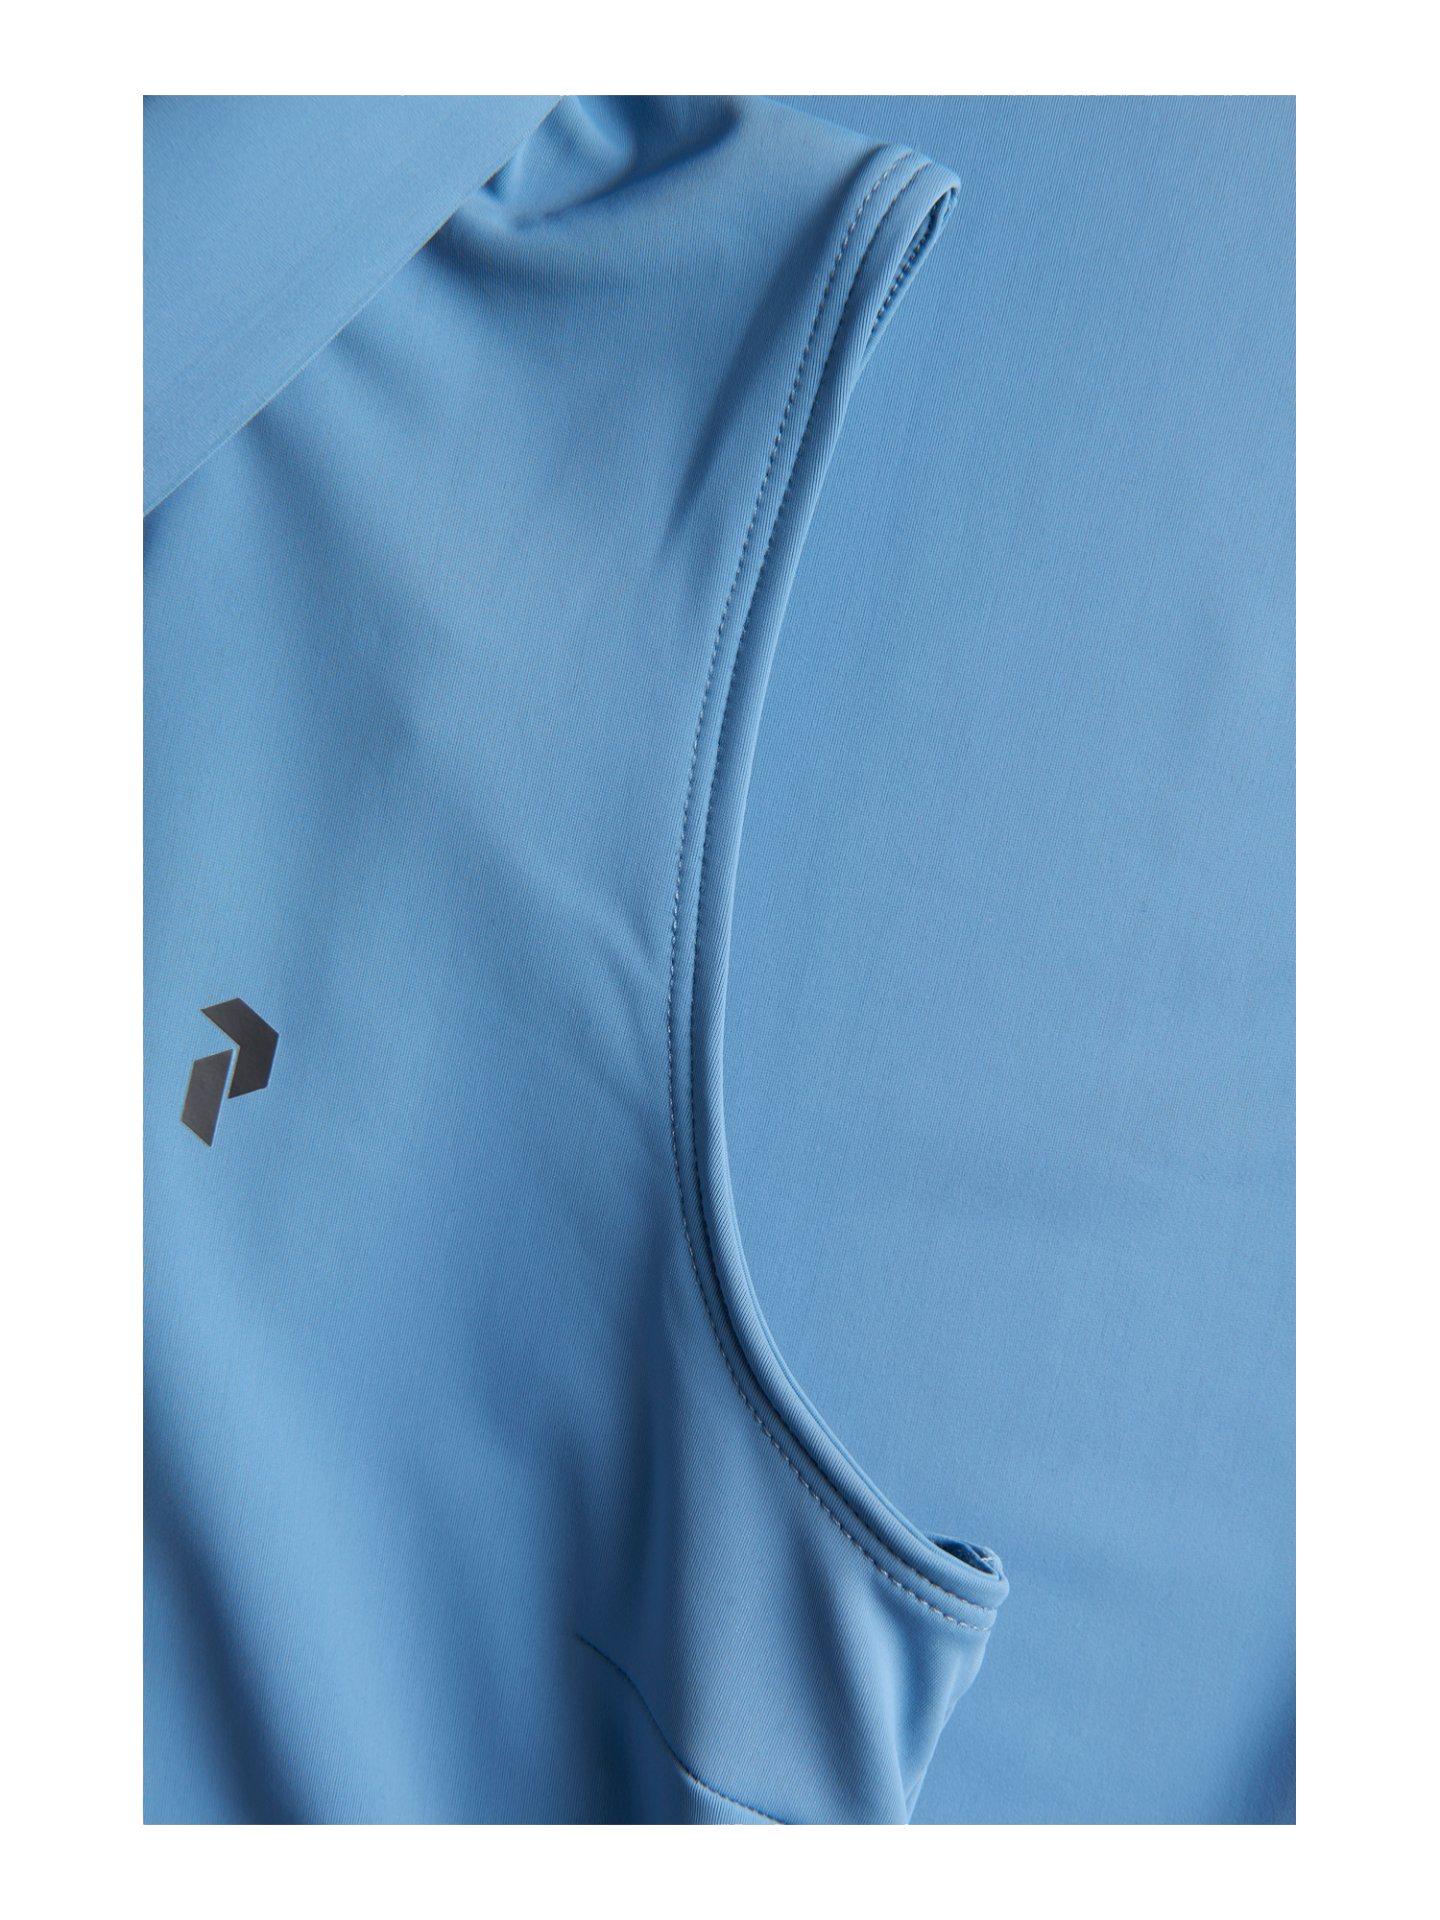 Peak Performance dames golfjurkje Trinity blauw